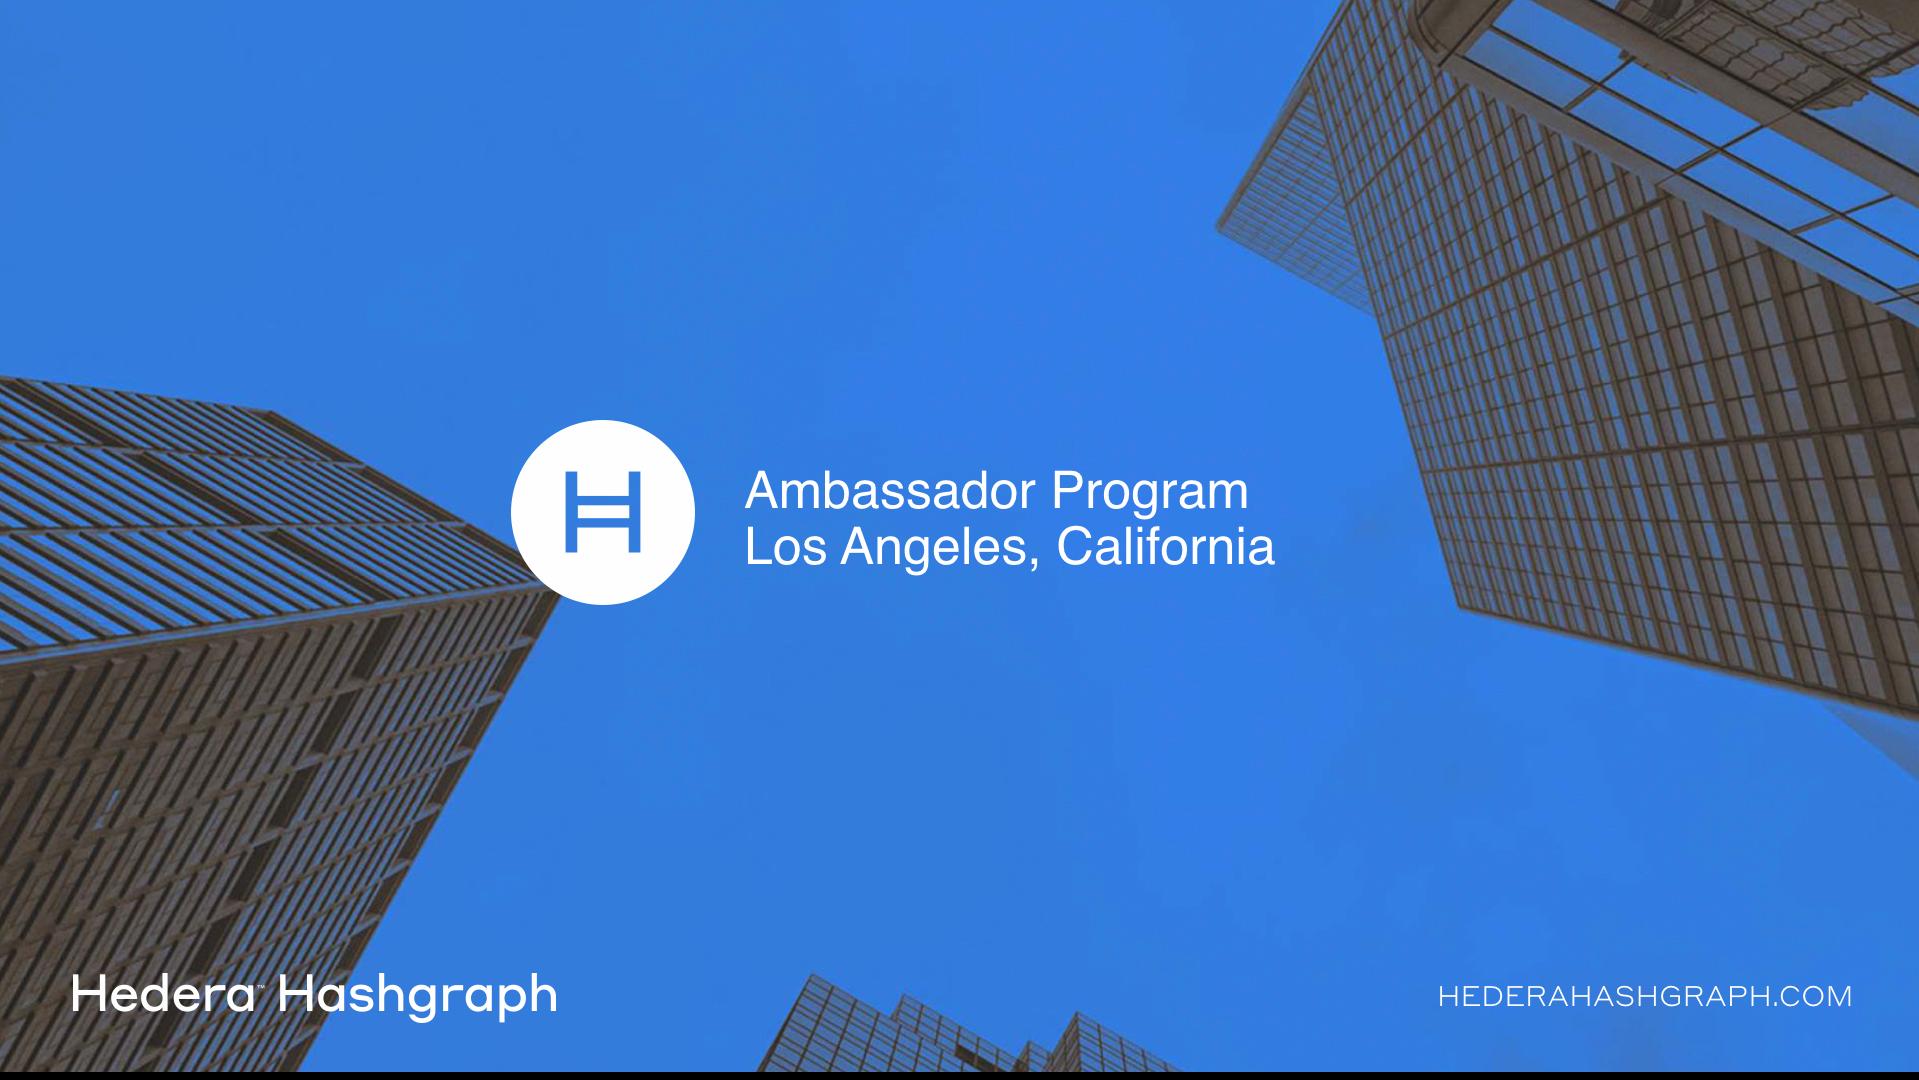 Hedera Hashgraph - Los Angeles California